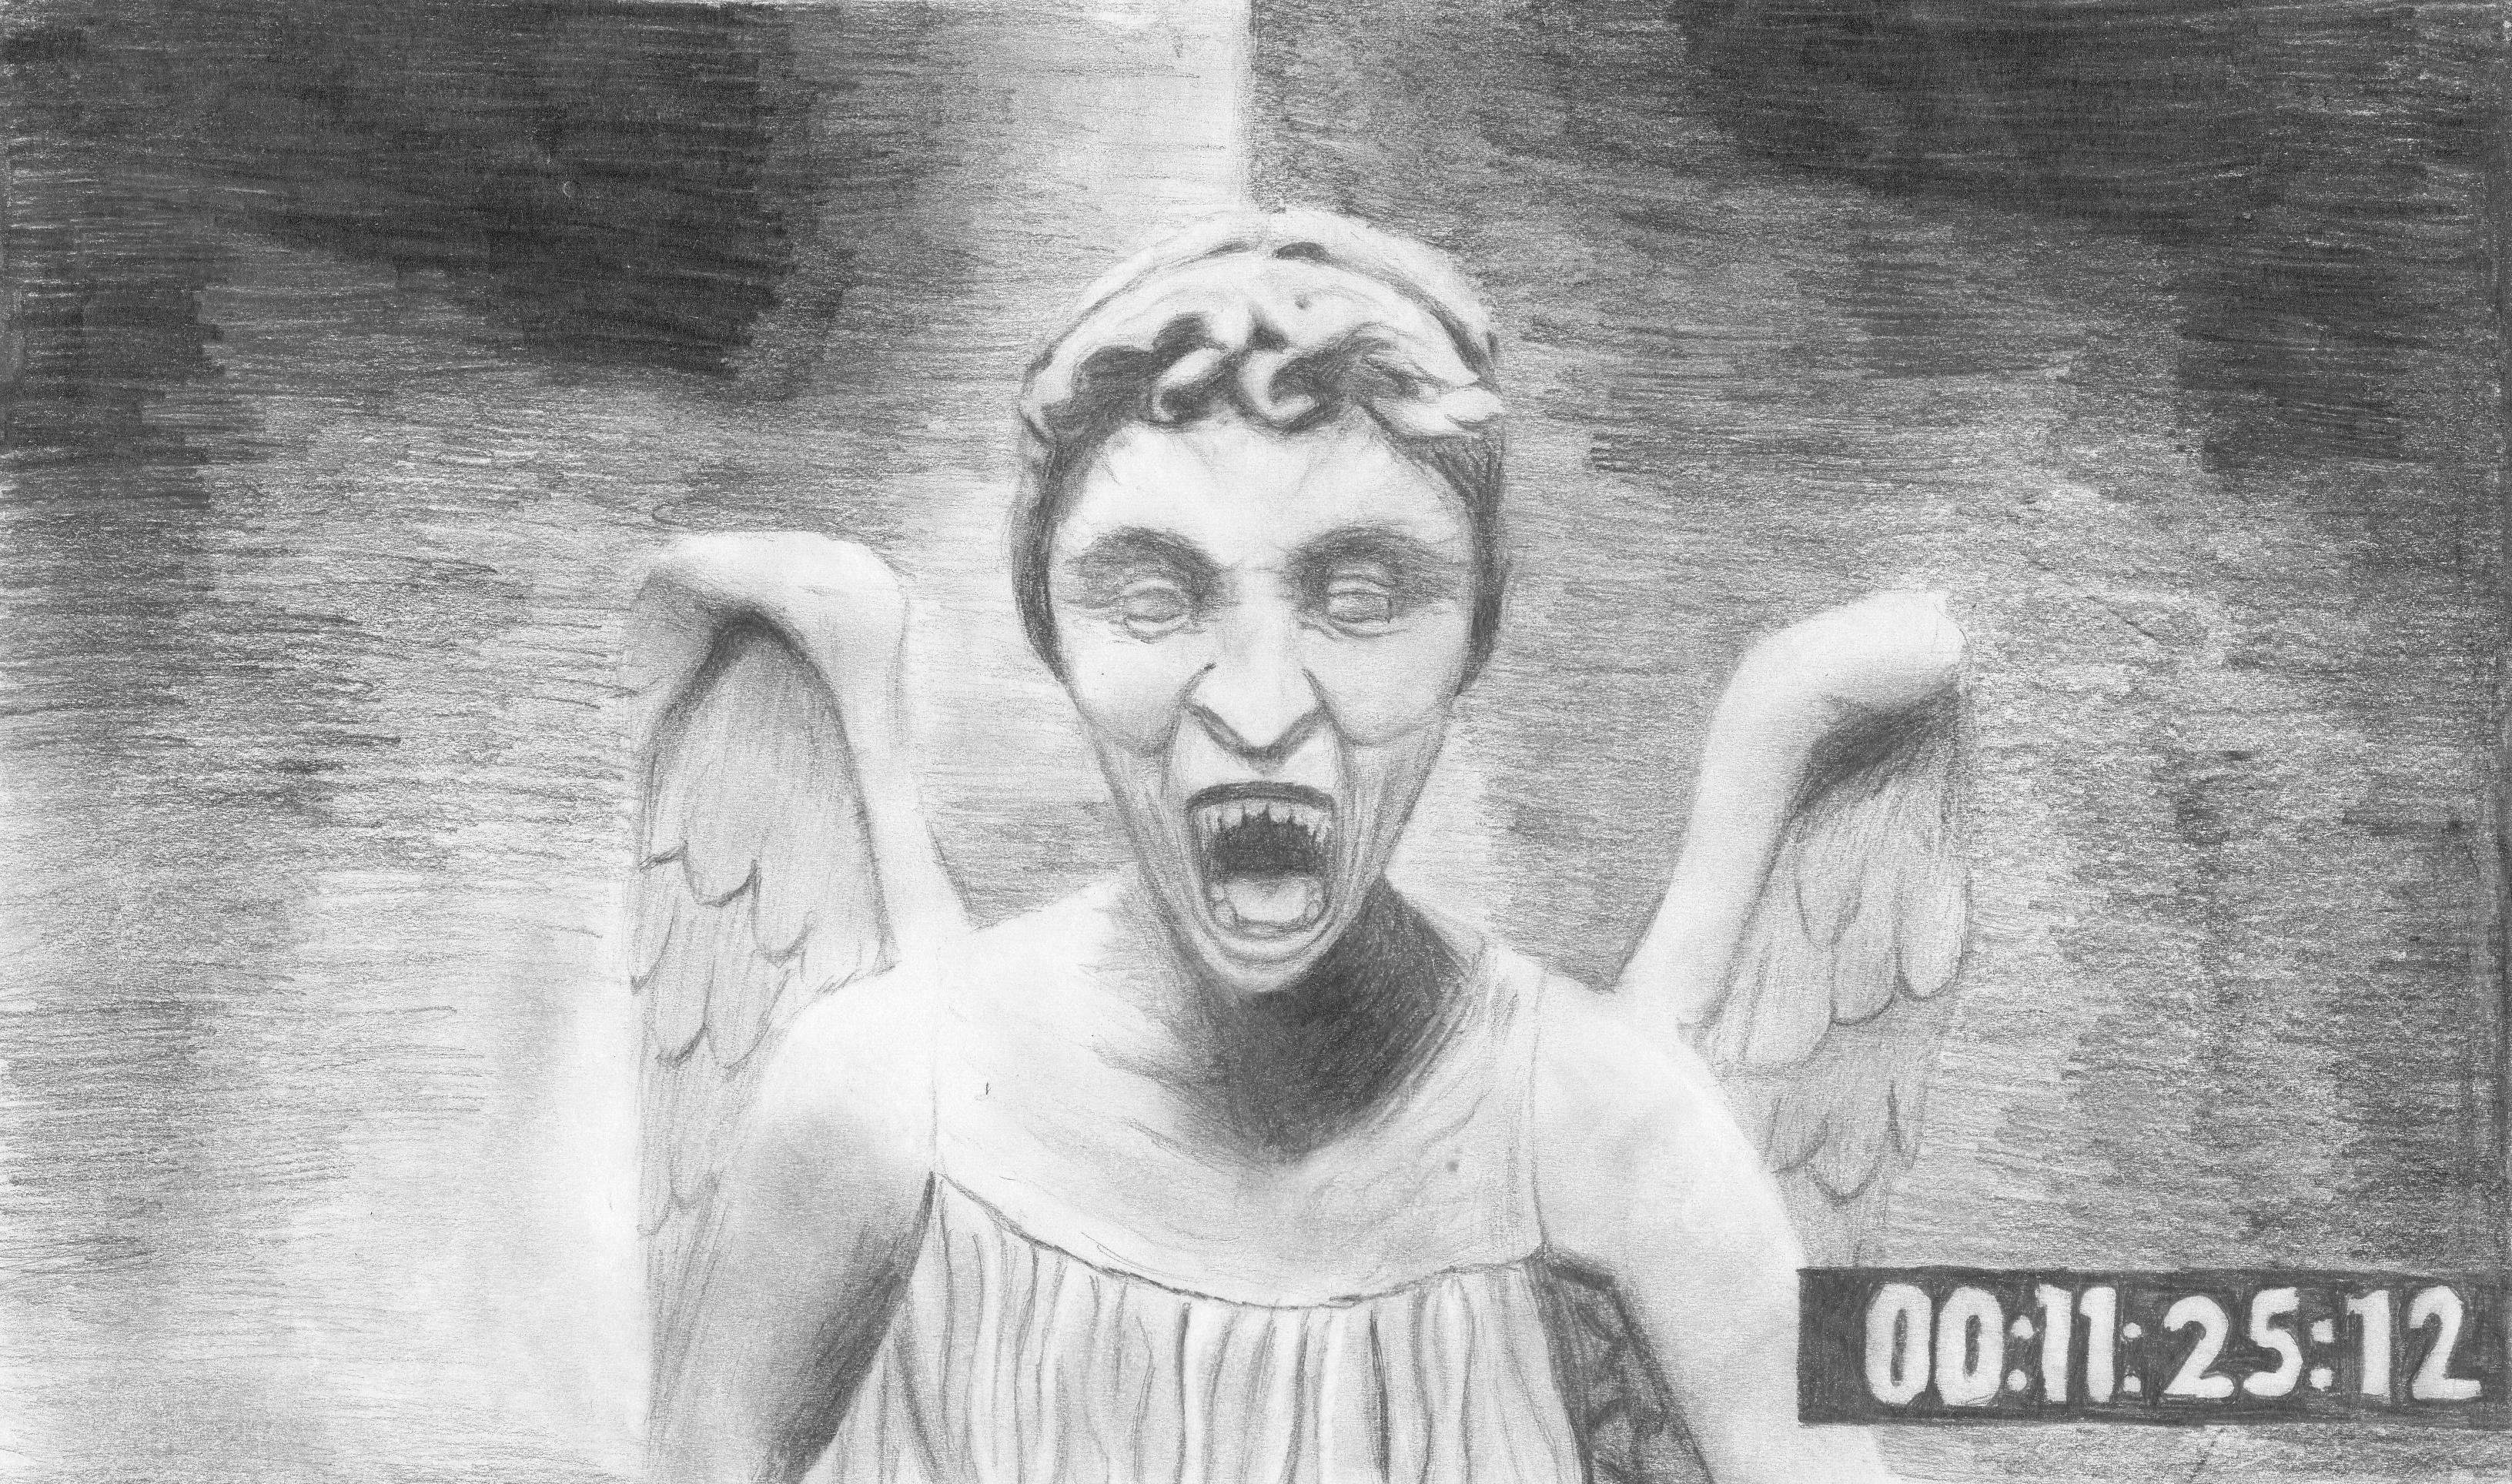 Weeping Angels Wallpaper Hd 9 Wide Wallpaperizcom 3263x1928